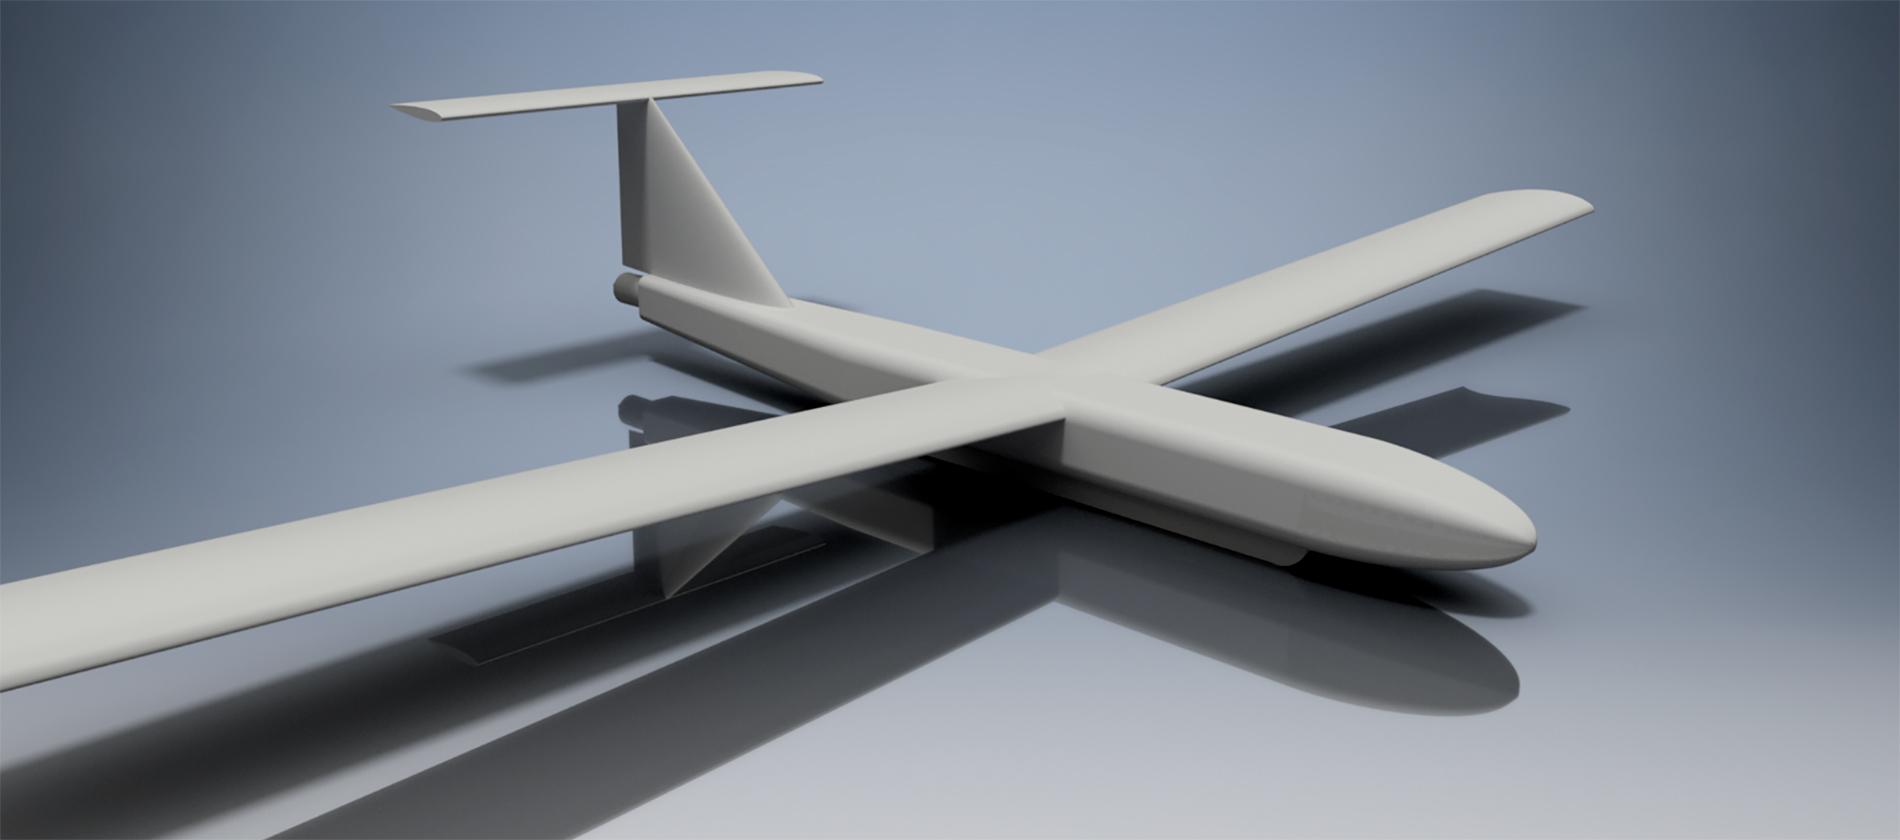 Eyercraft 2100 mini UAV render